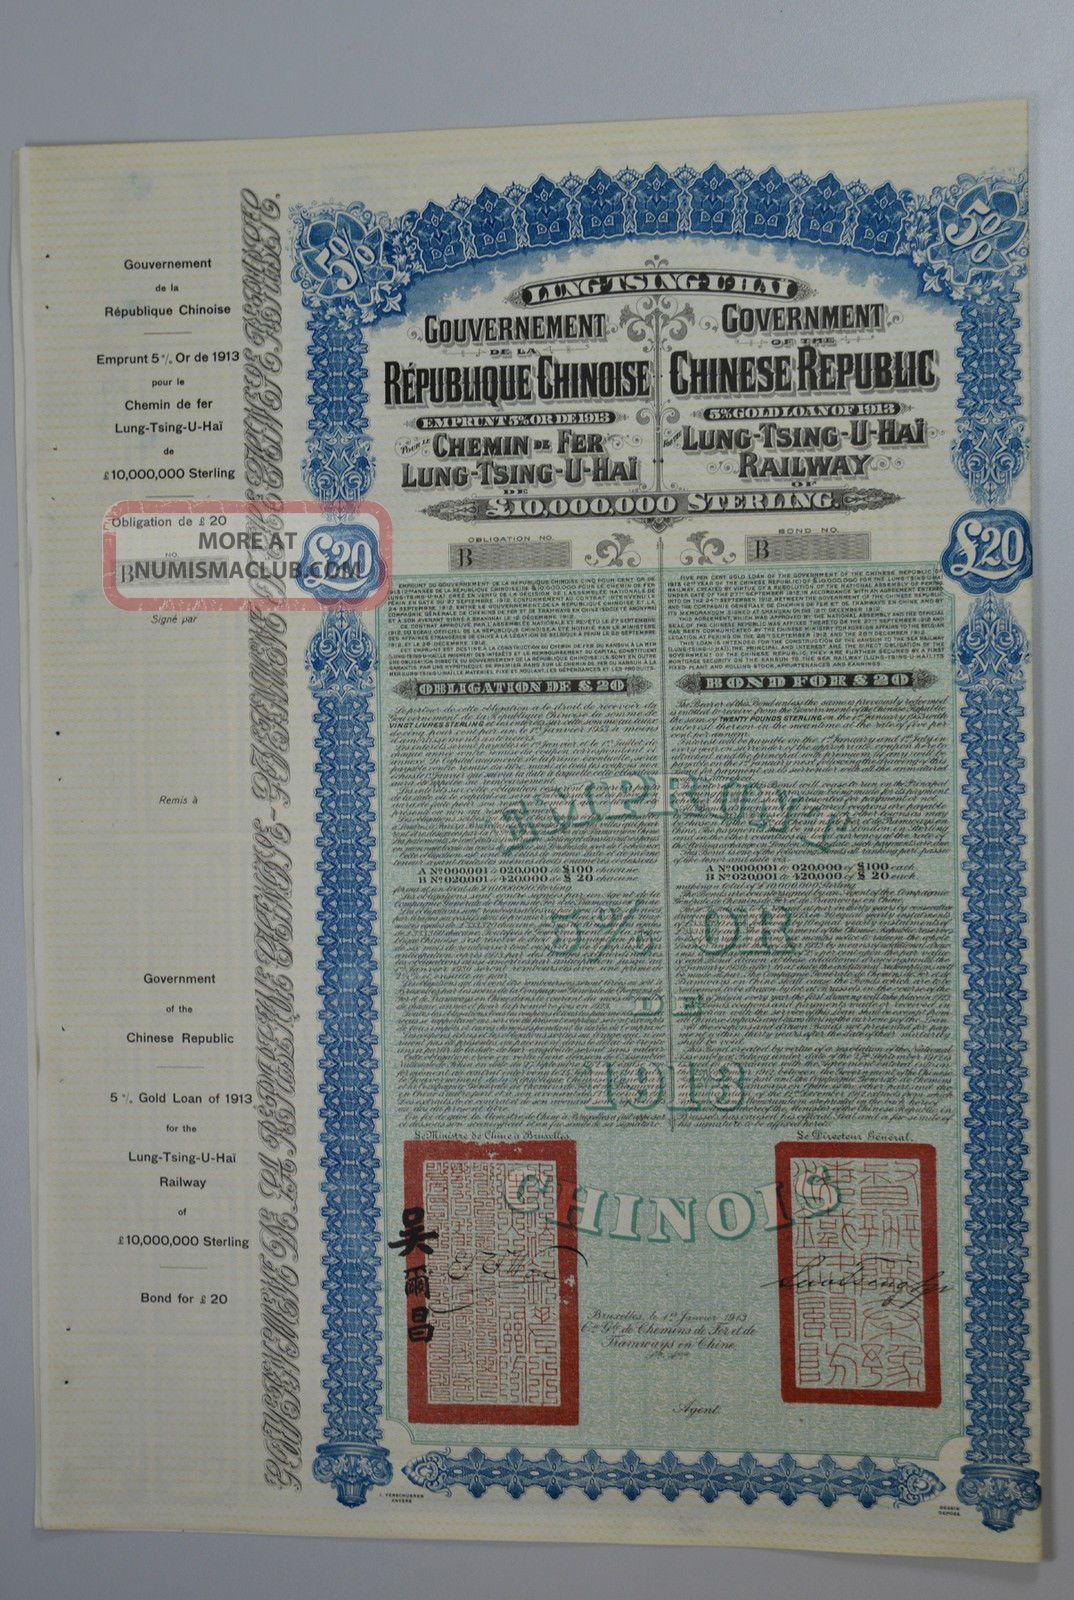 Lung Tsing U - Hai China 20 Pounds 1913 Rare Au Stocks & Bonds, Scripophily photo